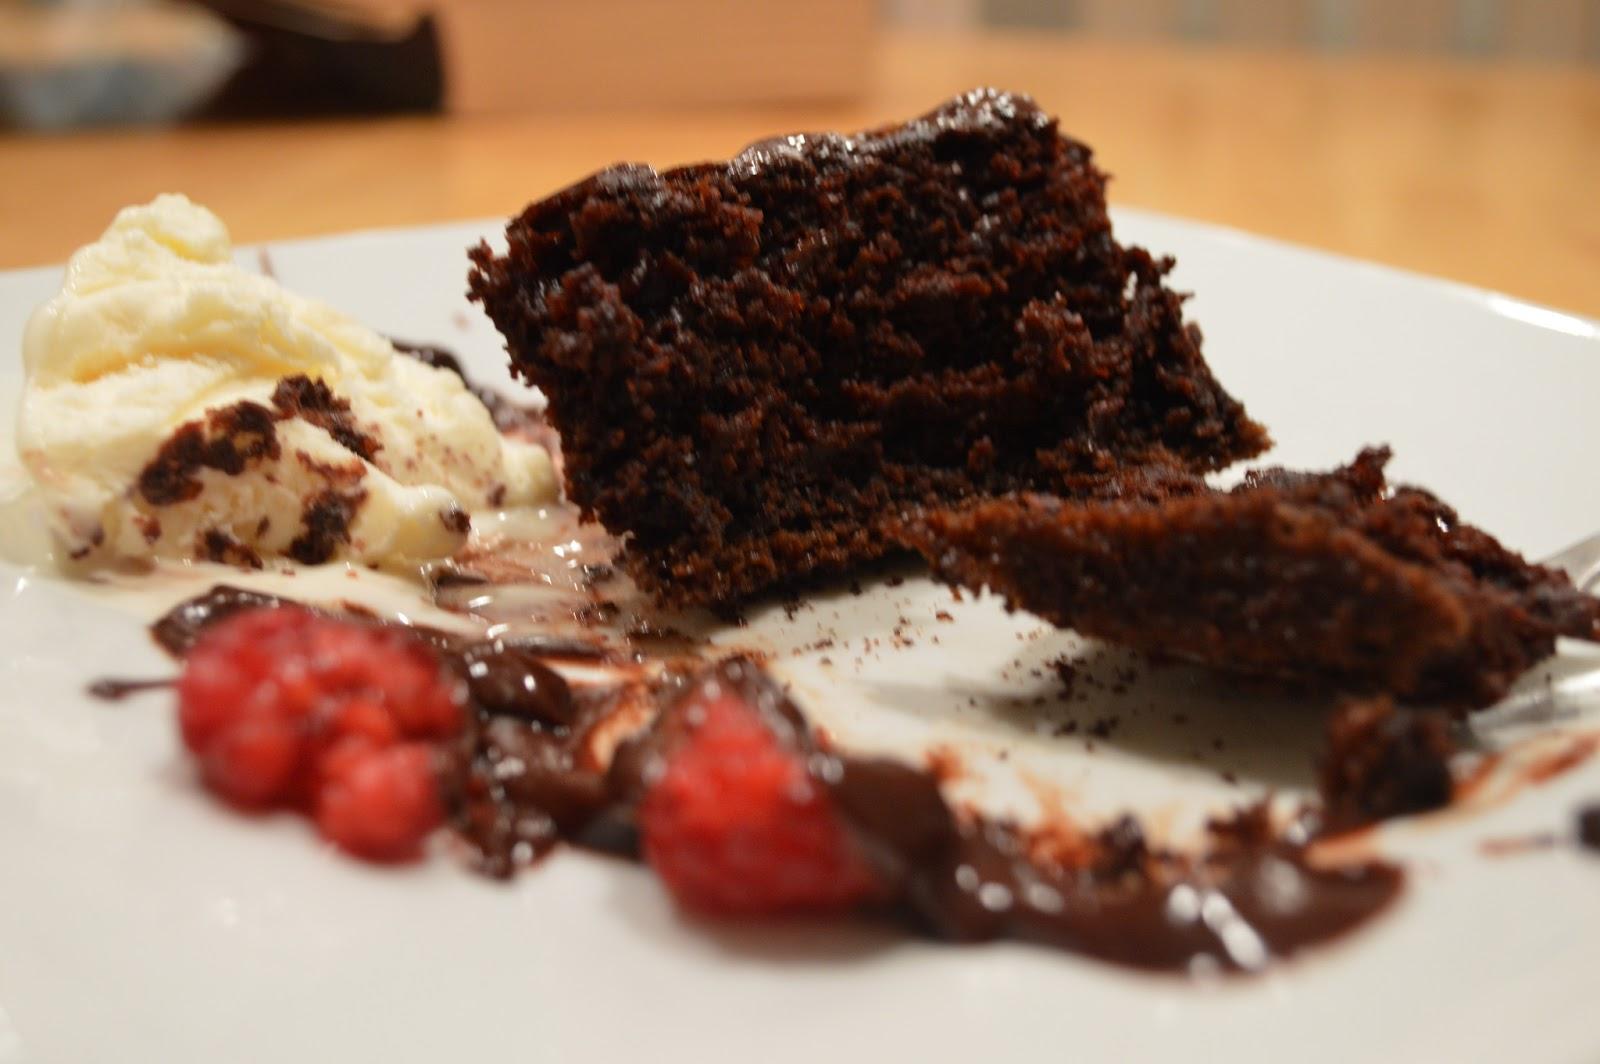 Cinnamon Streusel Coffee Cake Recipes Using Cocoa Powder